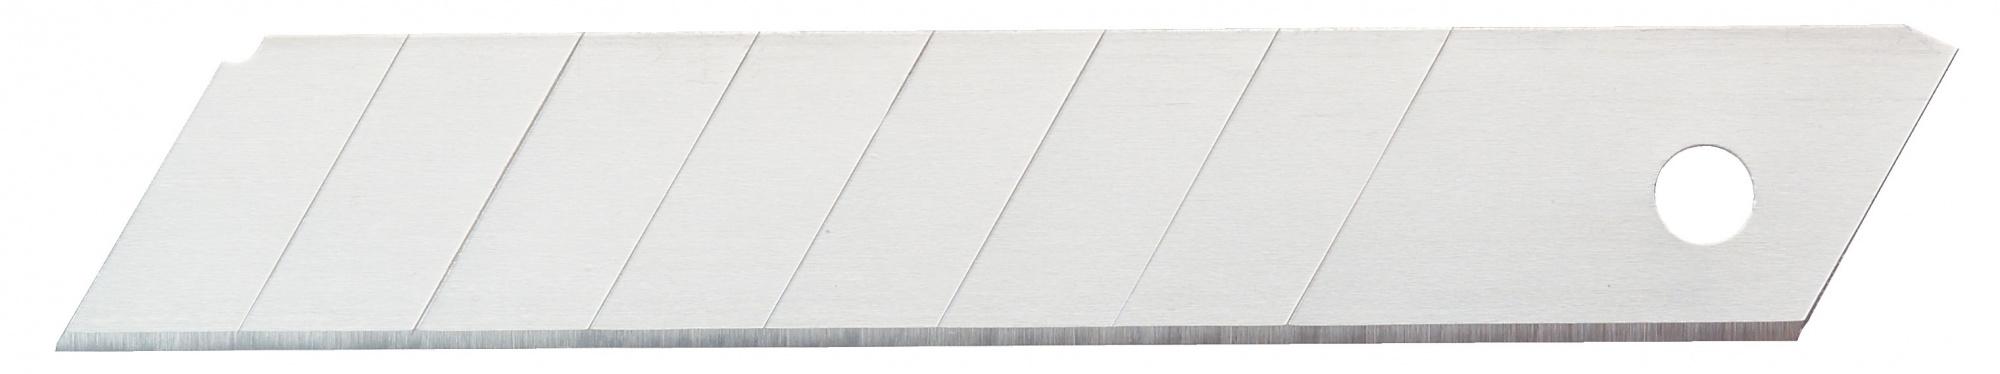 Irwin (10504558) - лезвие с отламывающимися сегментами 25 мм